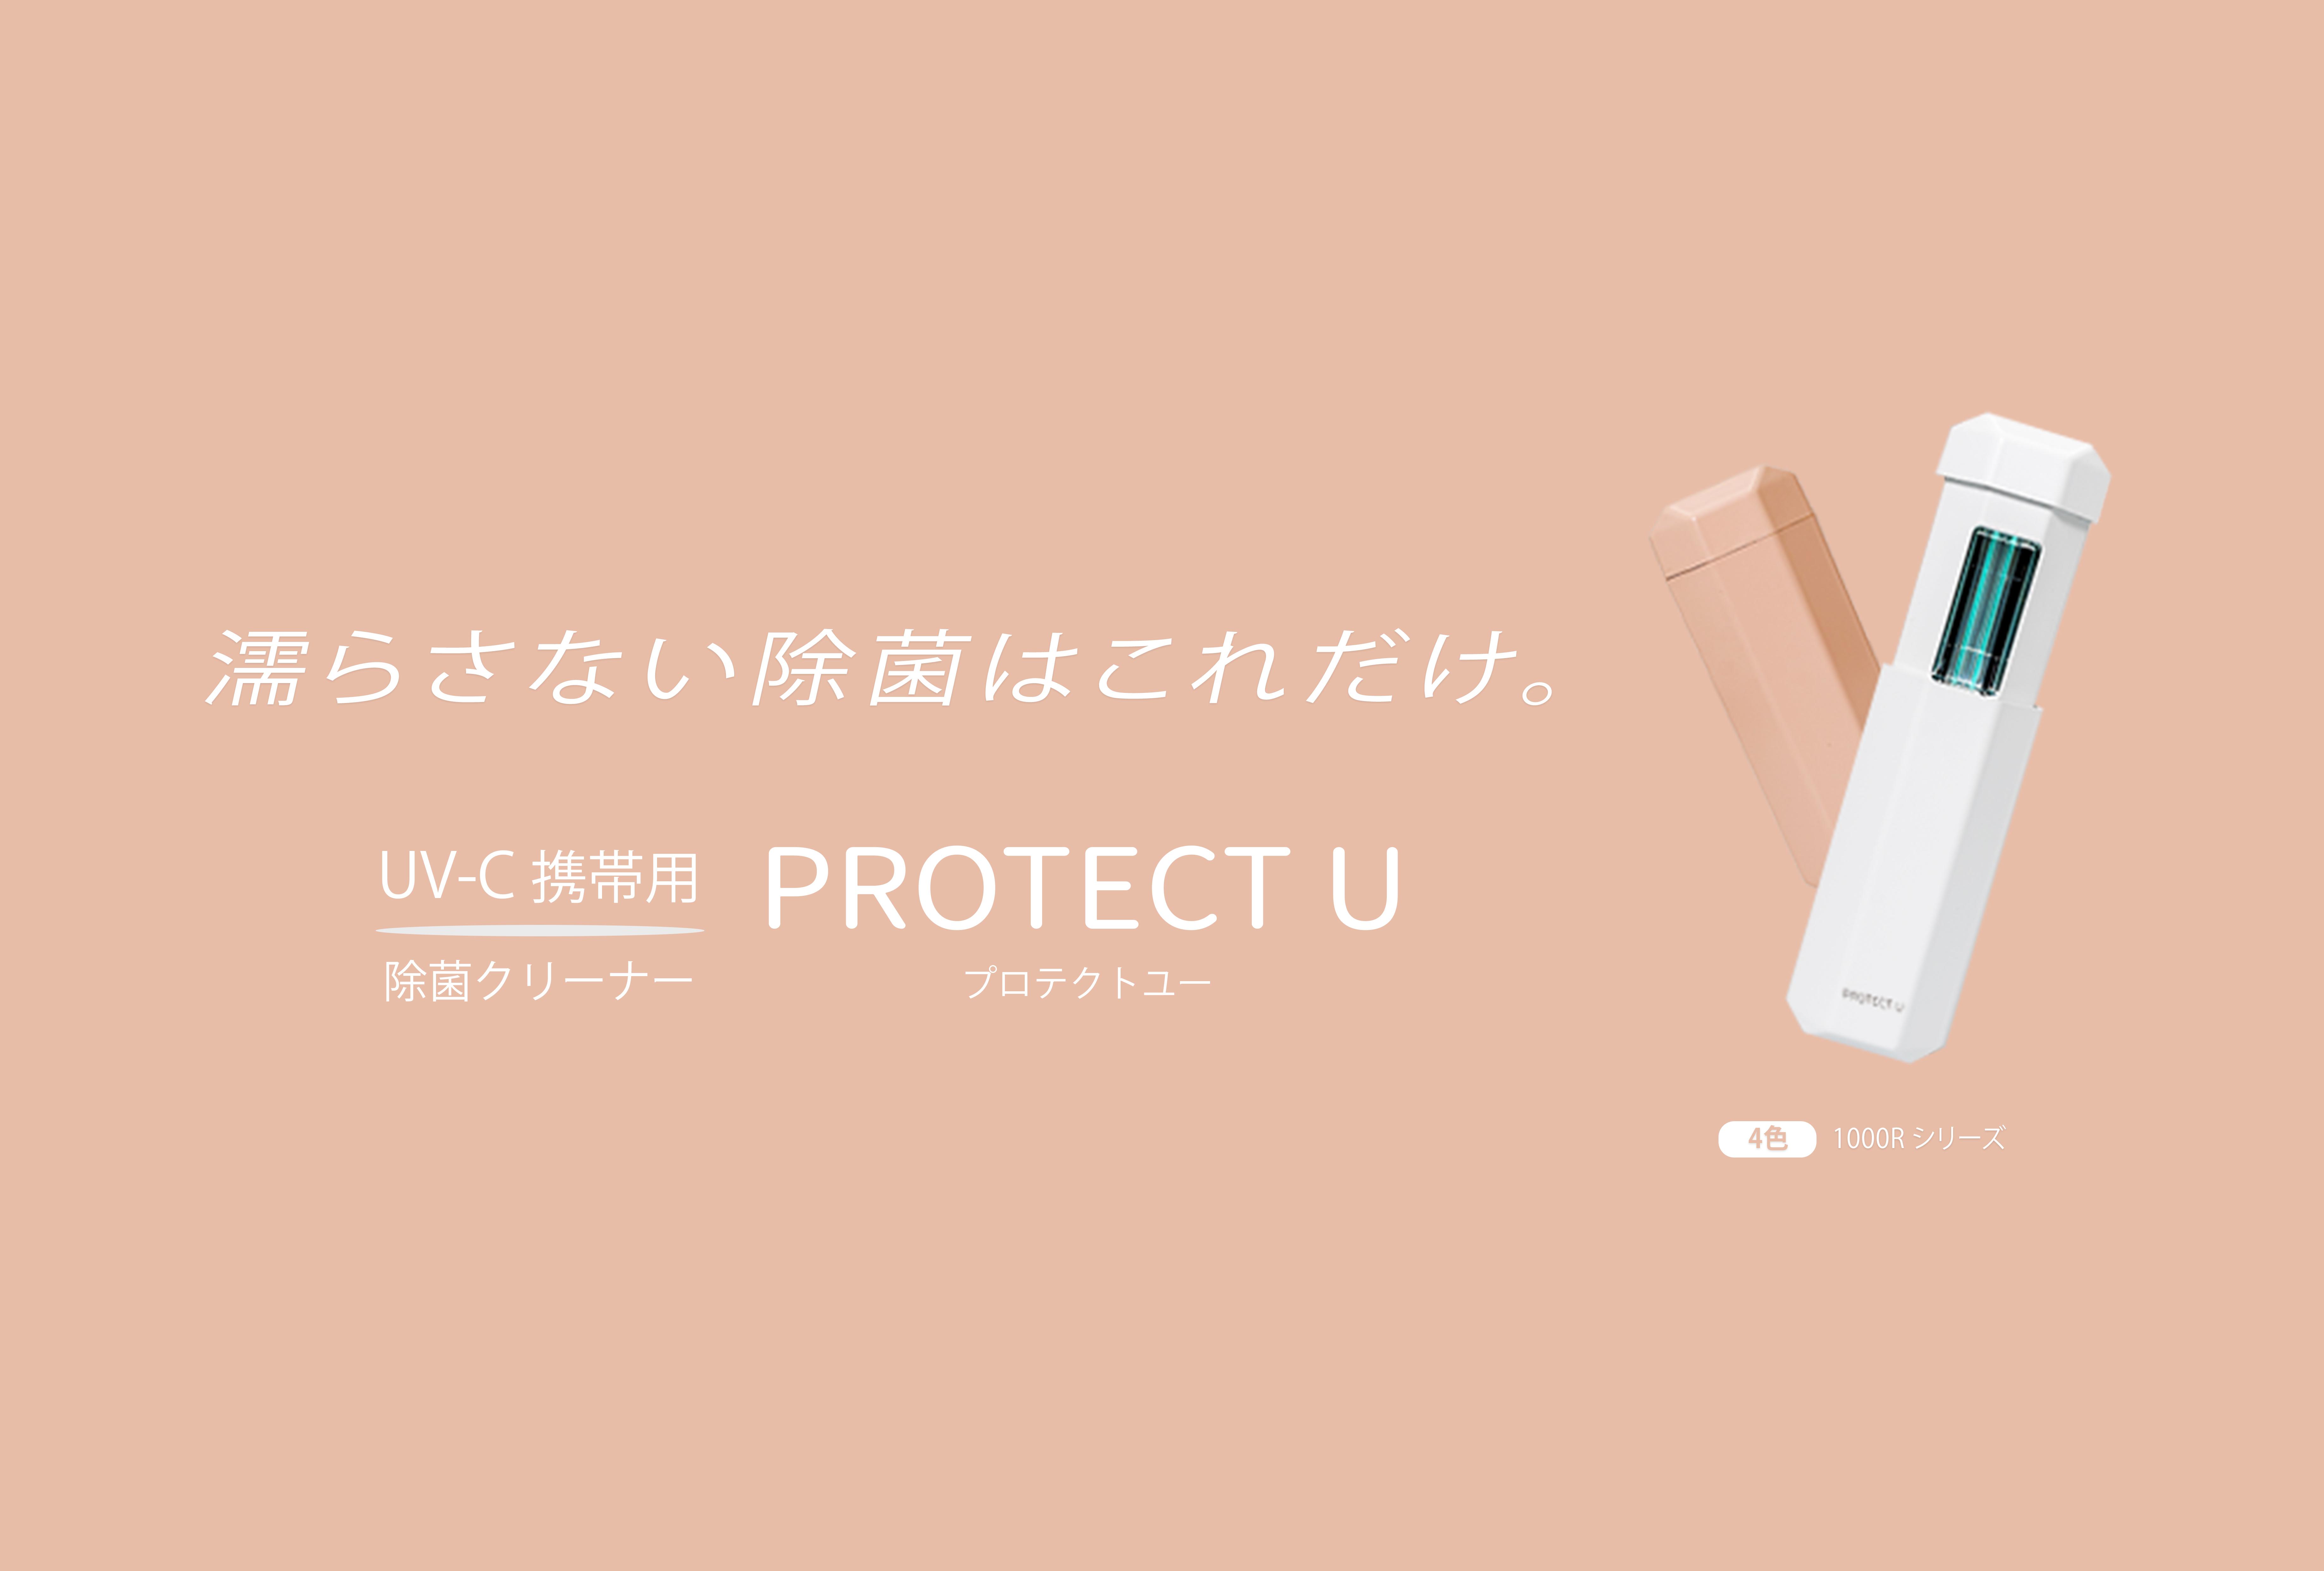 iRiS Japan LLC. 事業内容 - MOLFON